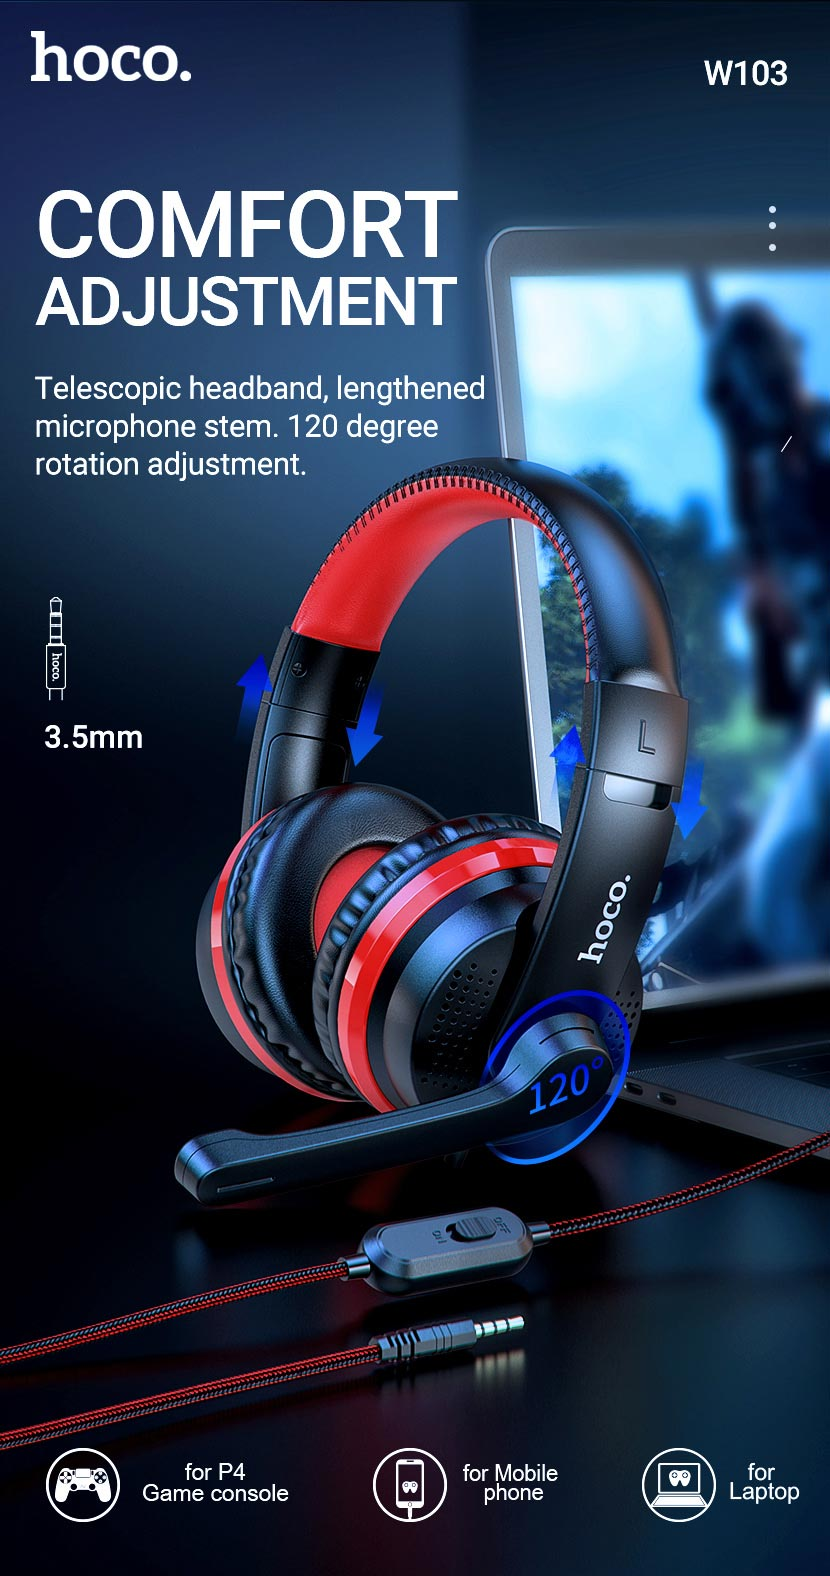 hoco news w103 magic tour gaming headphones adjustment en